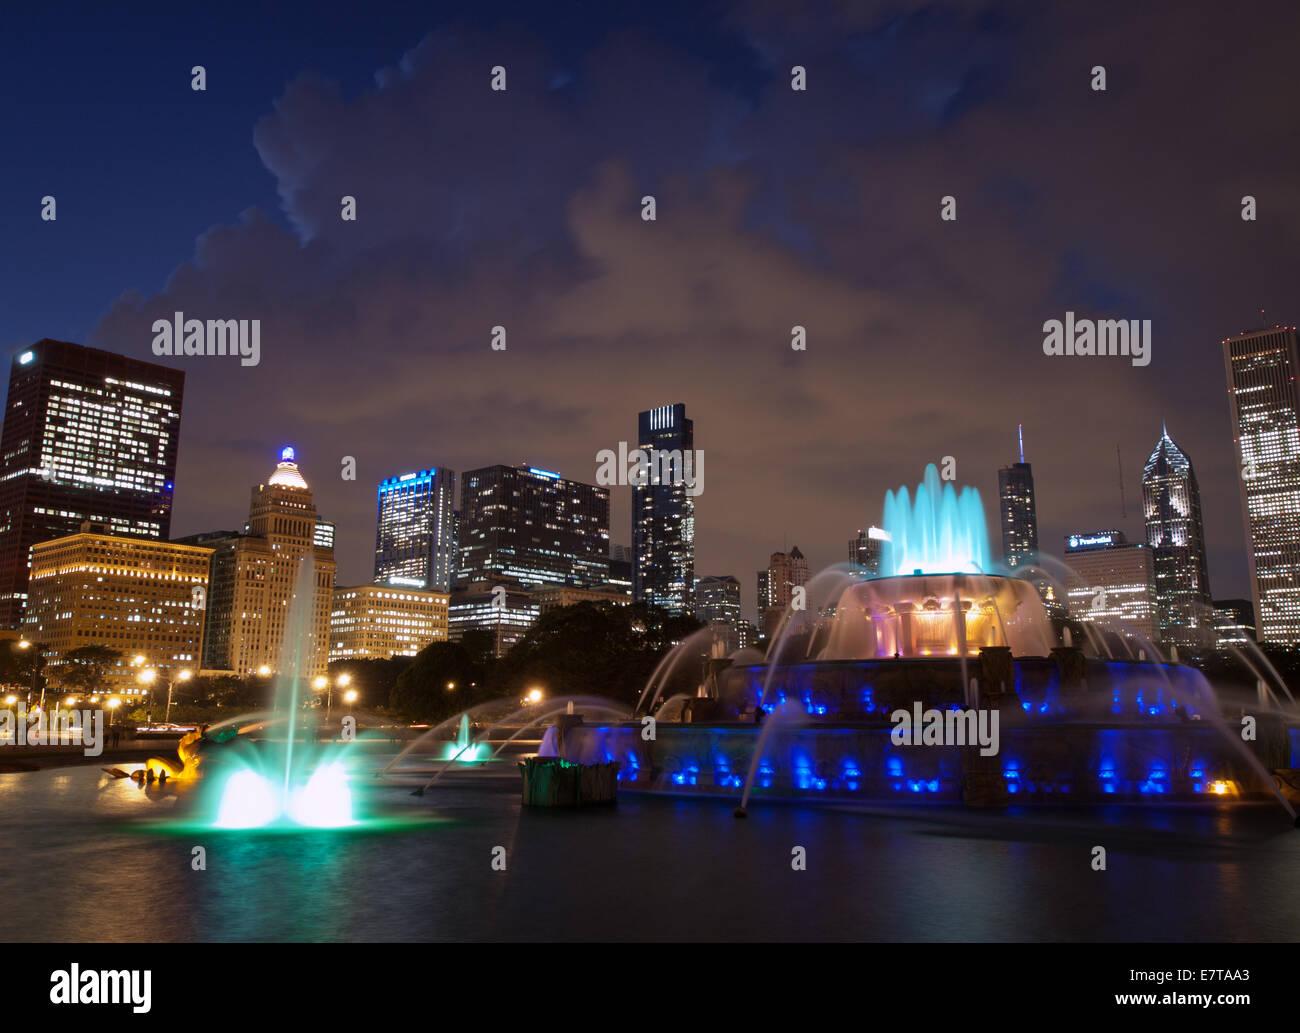 Grant Park Chicago Imágenes De Stock & Grant Park Chicago Fotos De ...